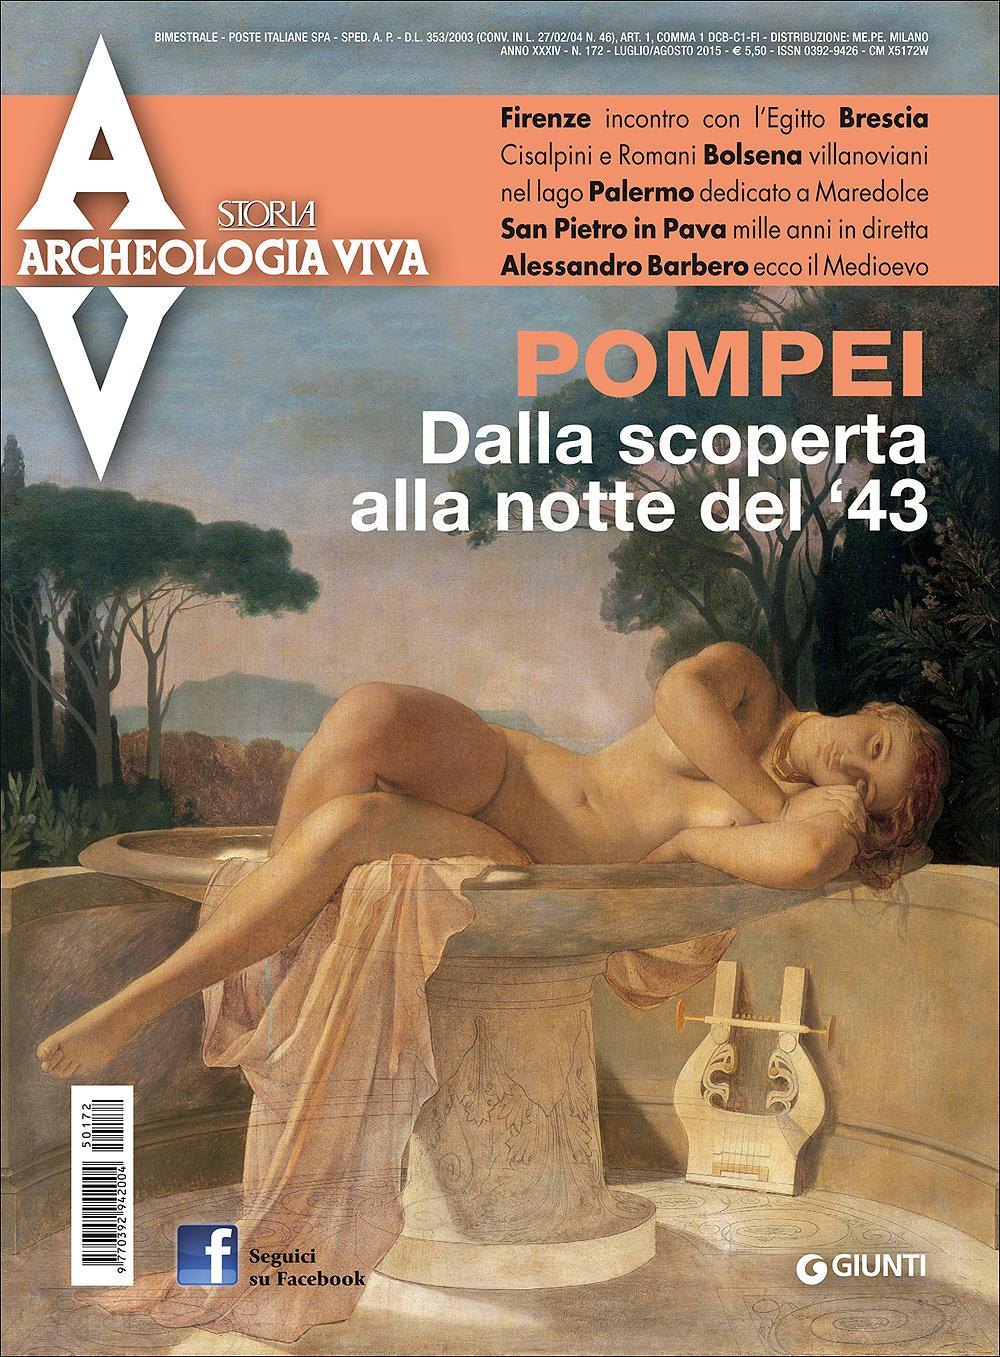 Archeologia Viva n. 172 - luglio/agosto 2015